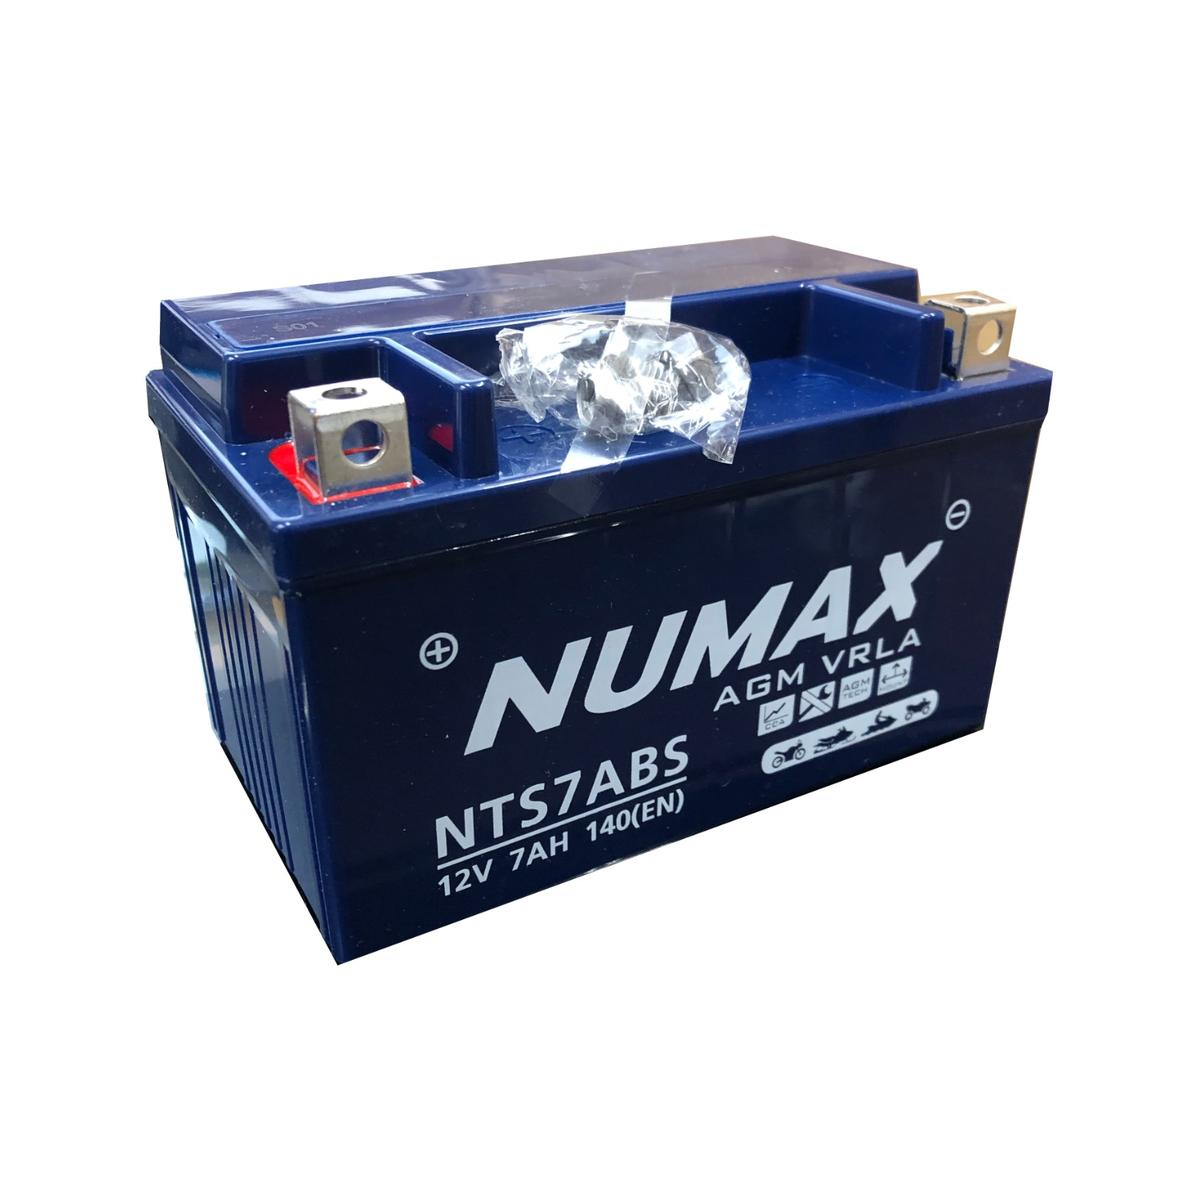 Numax NTS7ABS 12v Motorbike Bike Battery KYMCO 125cc Jockey YTX7A-4